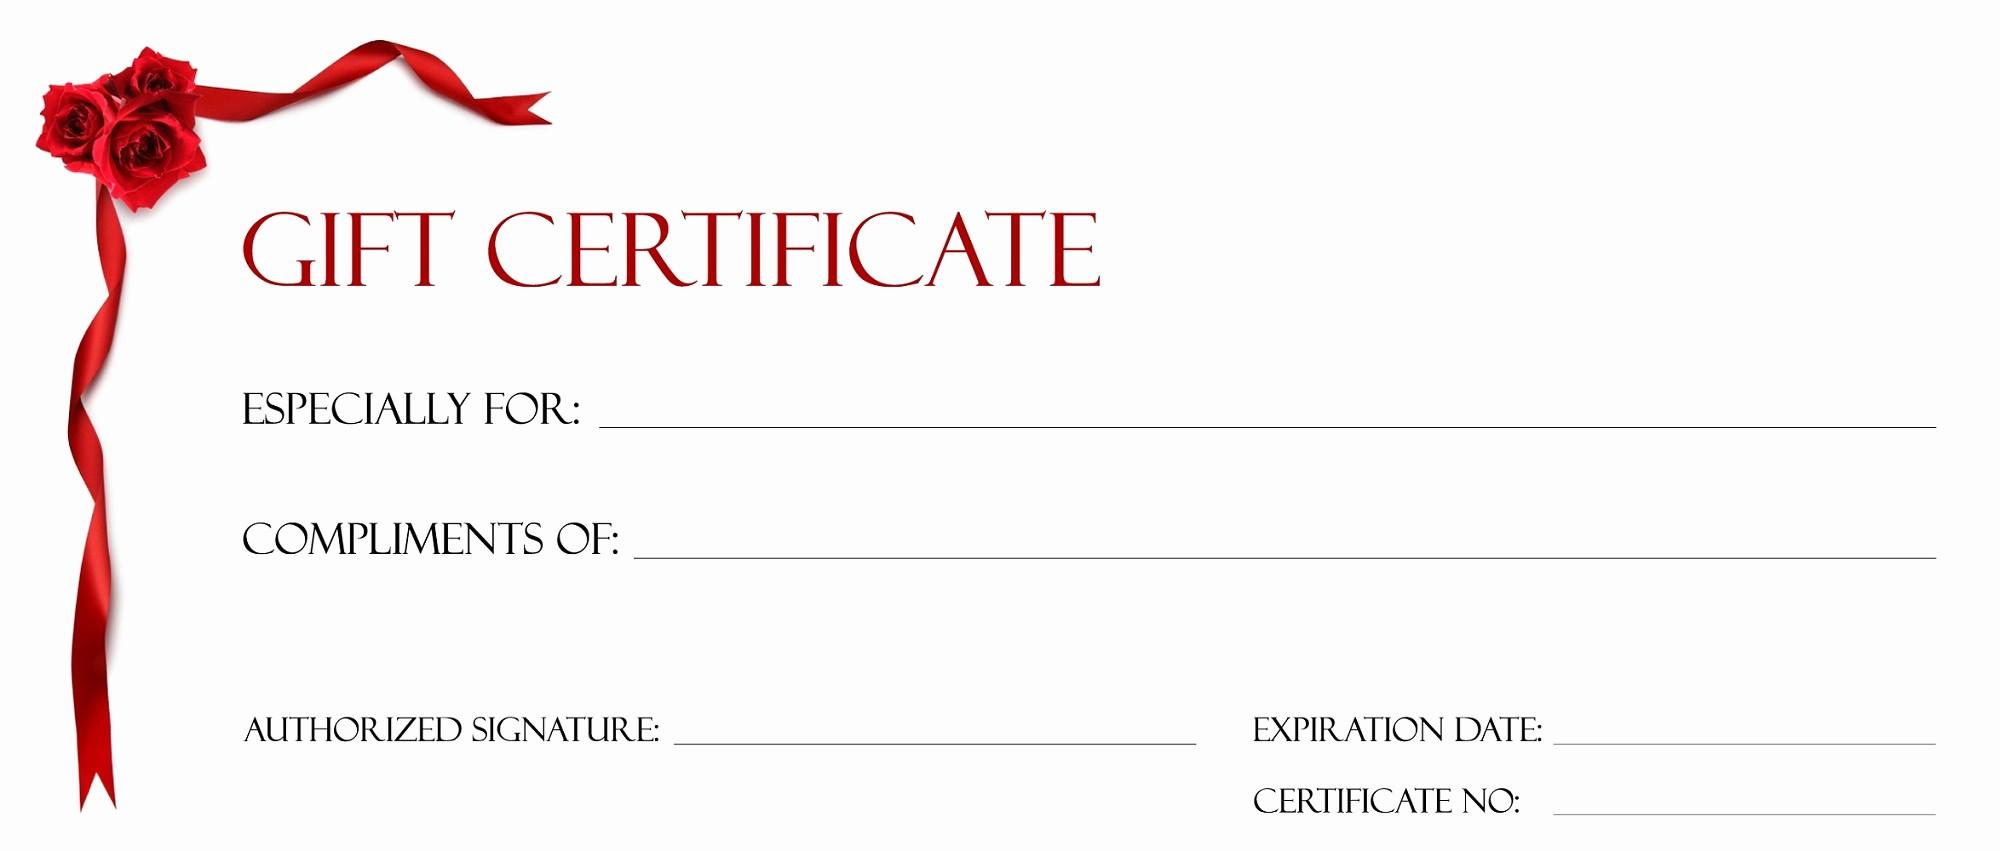 Blank Gift Certificates to Print Elegant Gift Certificate Template for Kids Blanks